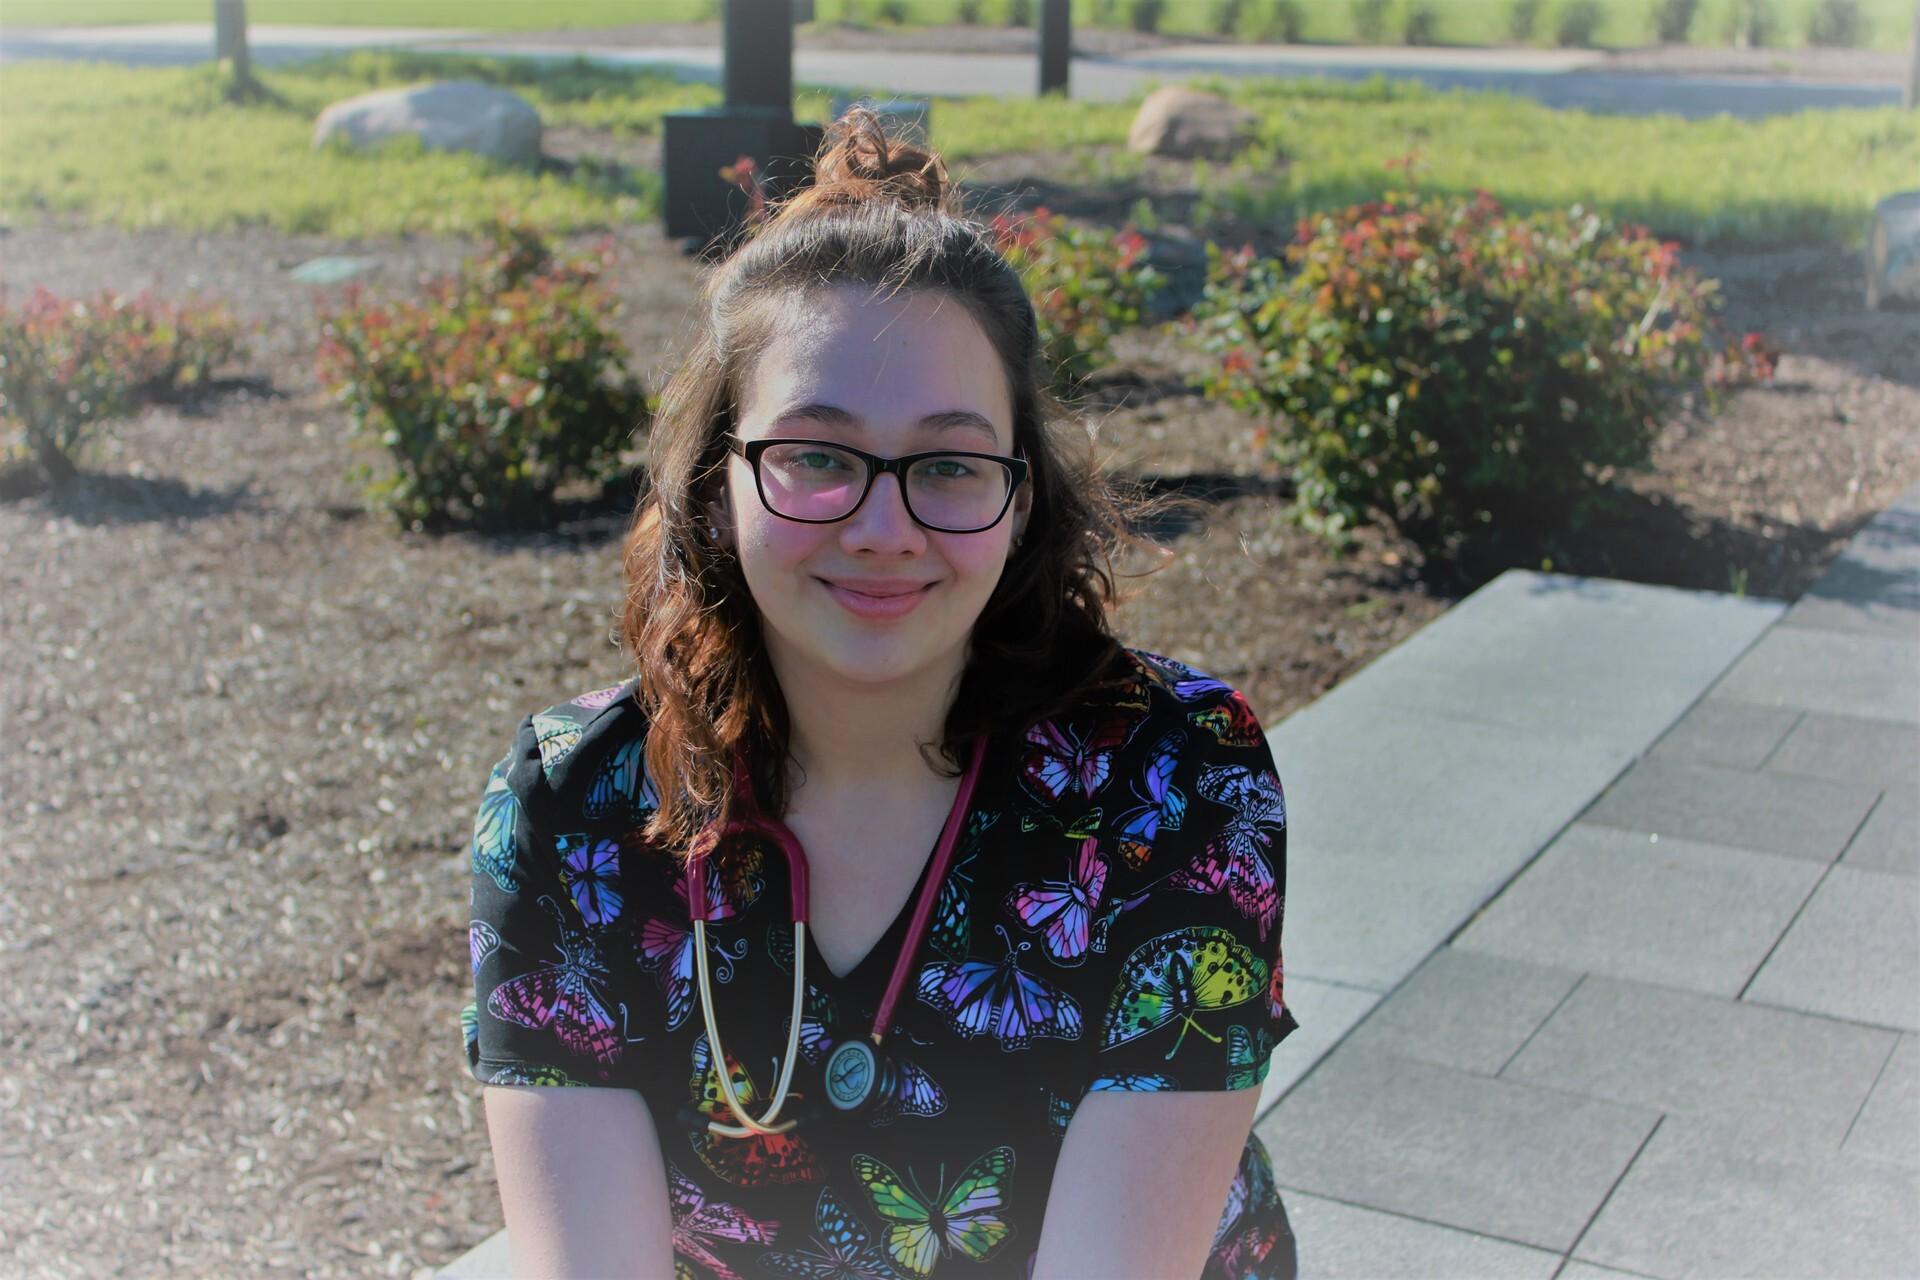 Kasey Myers, Scarlet Oaks Career Campus